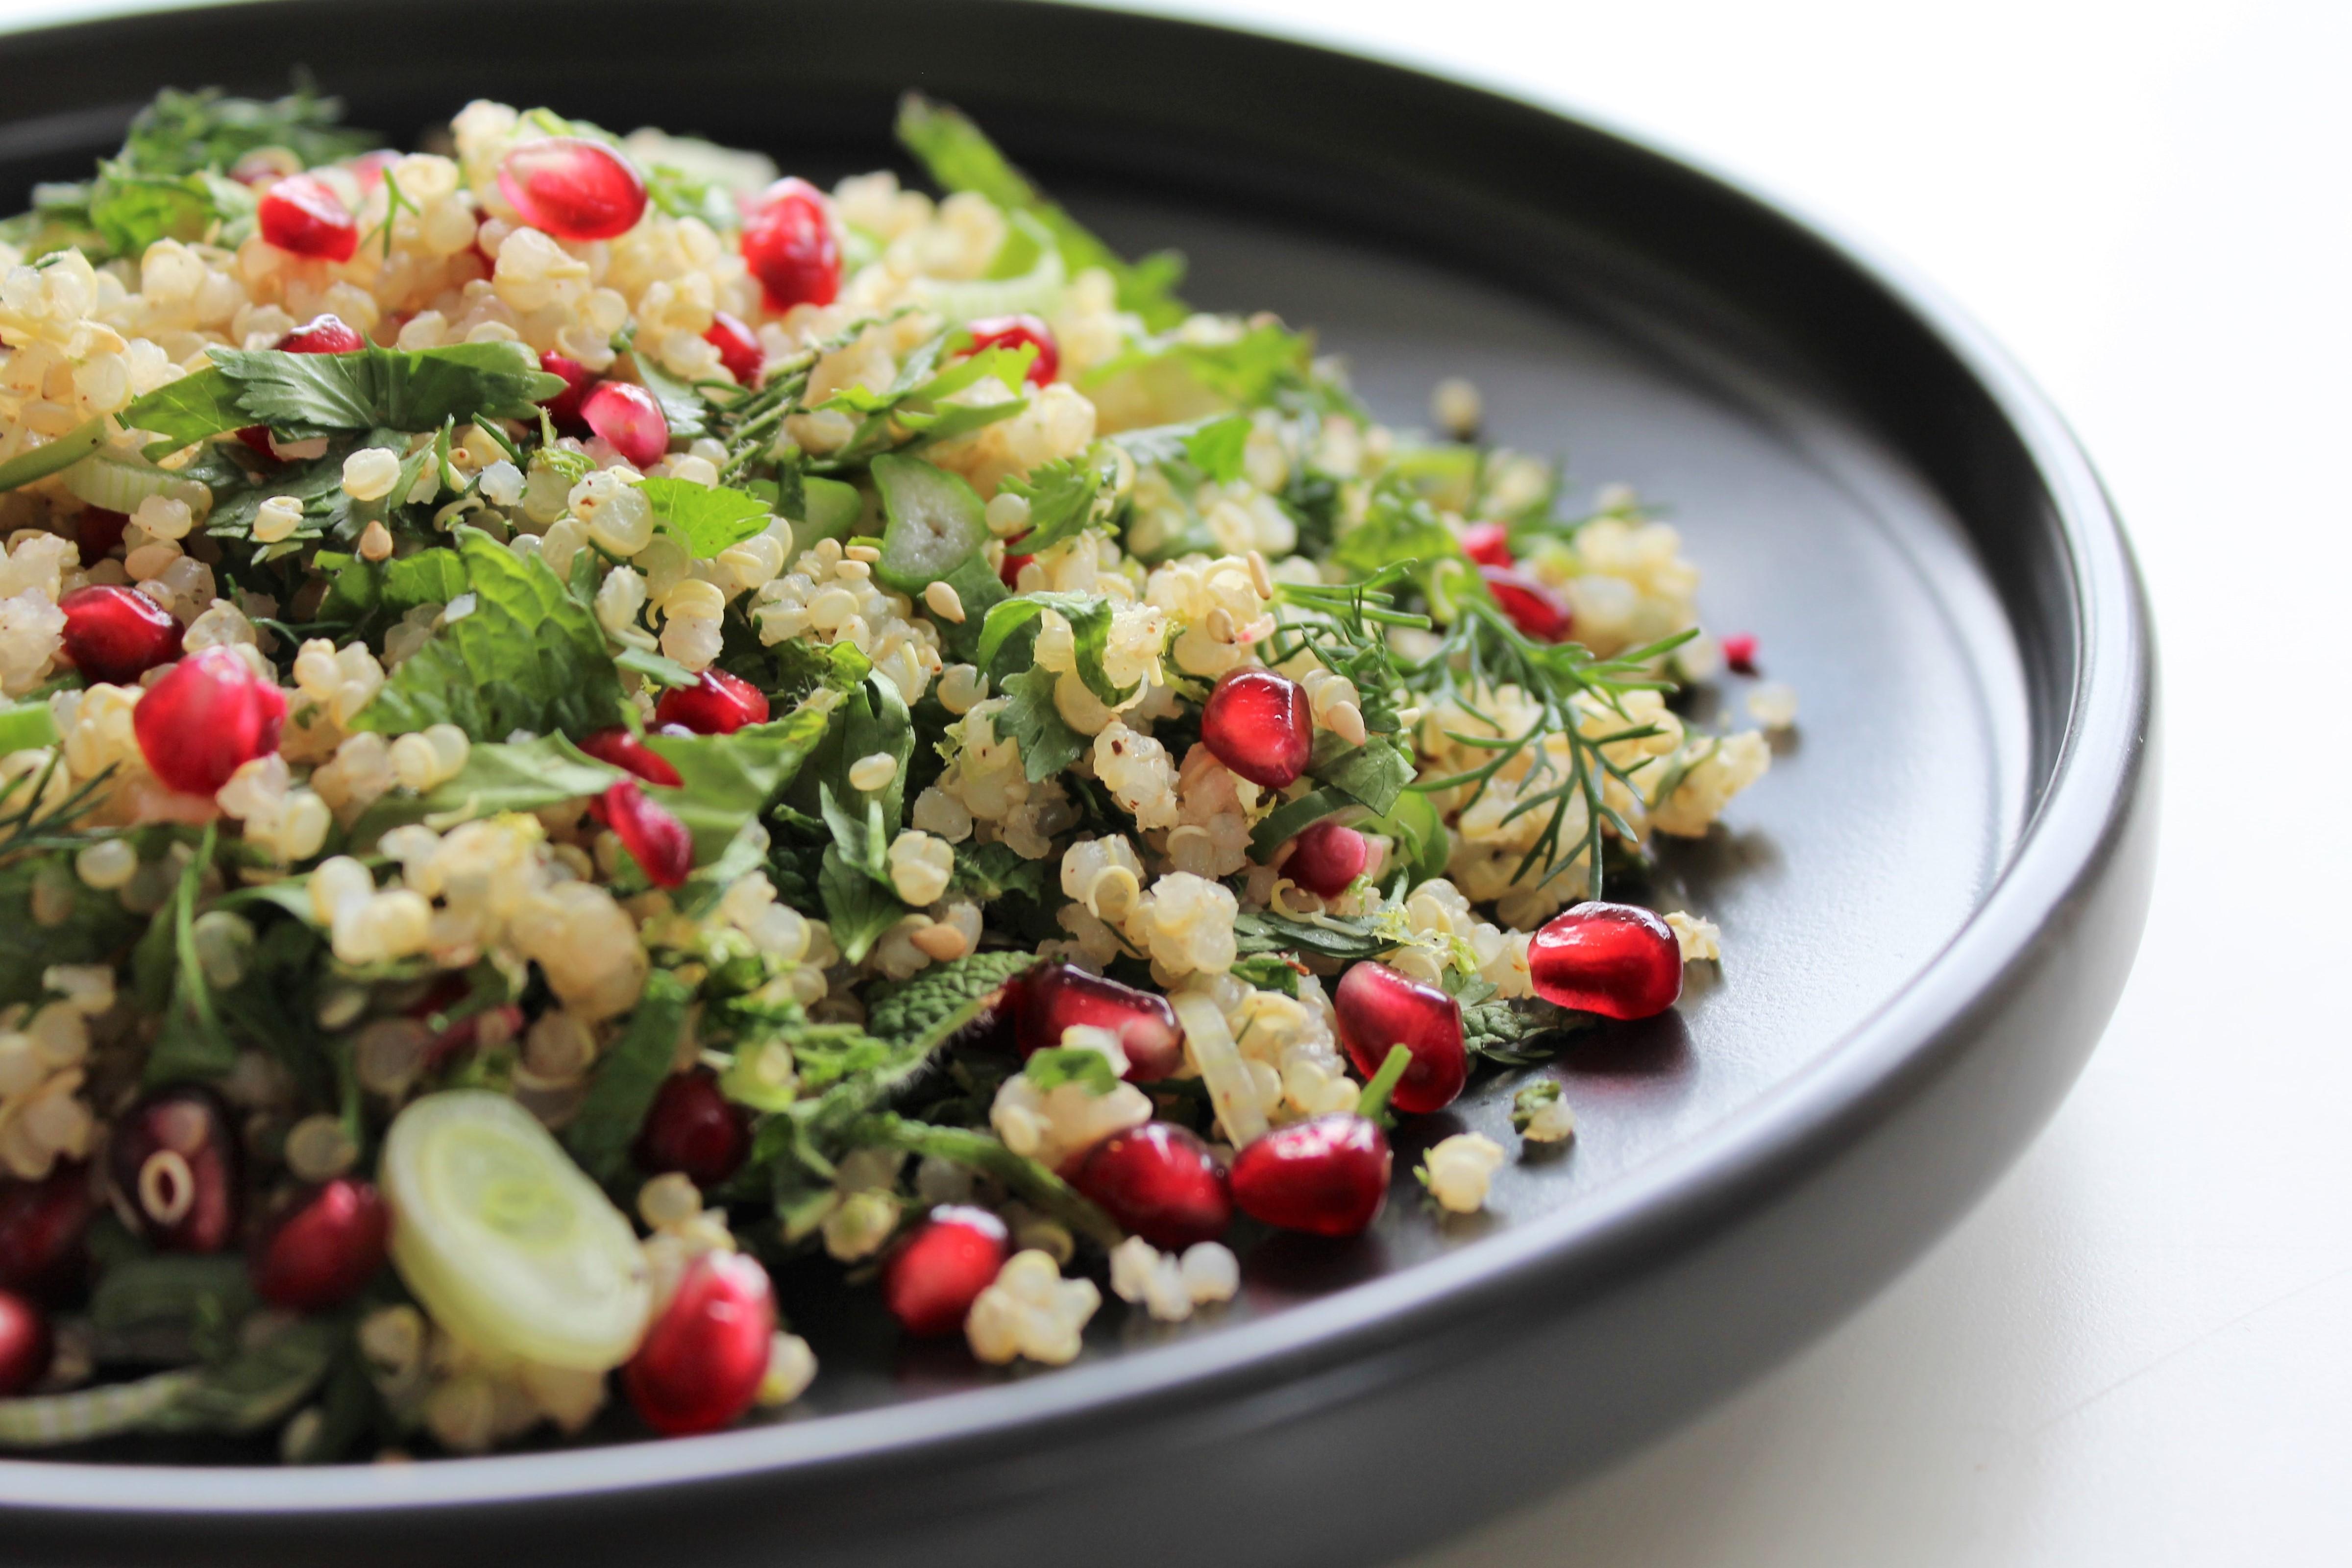 Salade de Quinoa aux Herbes - 1.2.3. Veggie